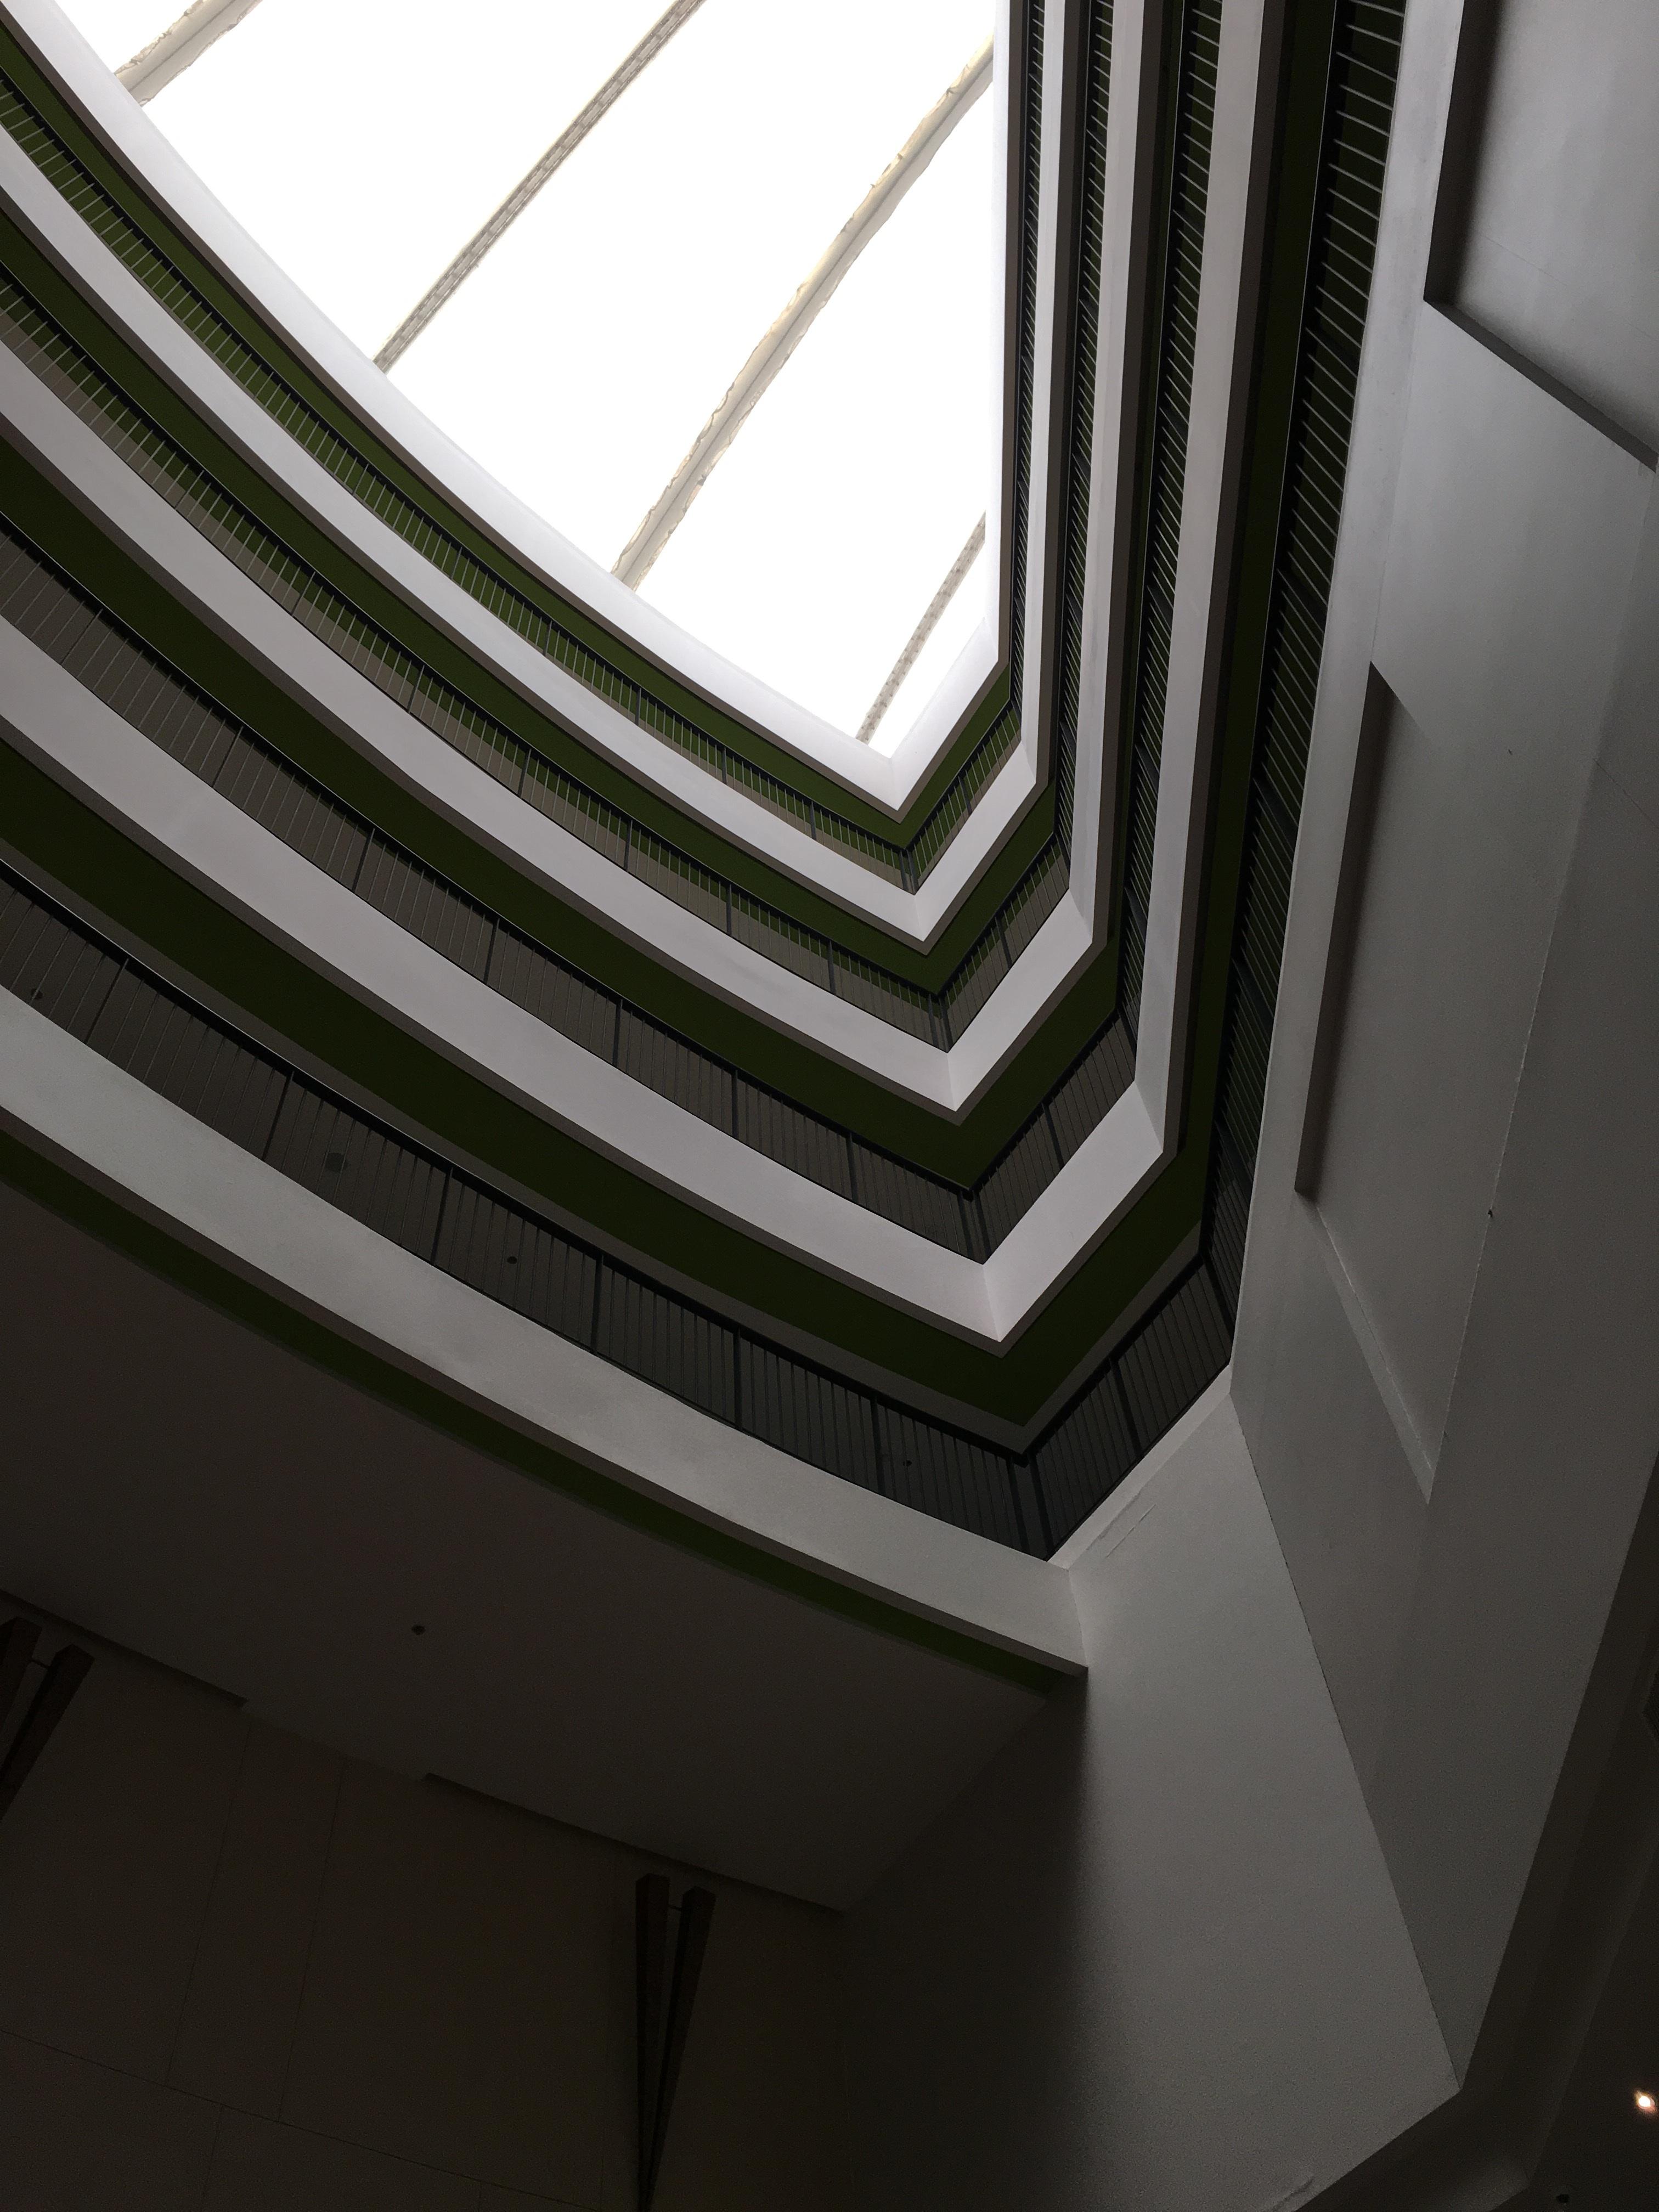 fotos gratis ligero arquitectura blanco casa piso